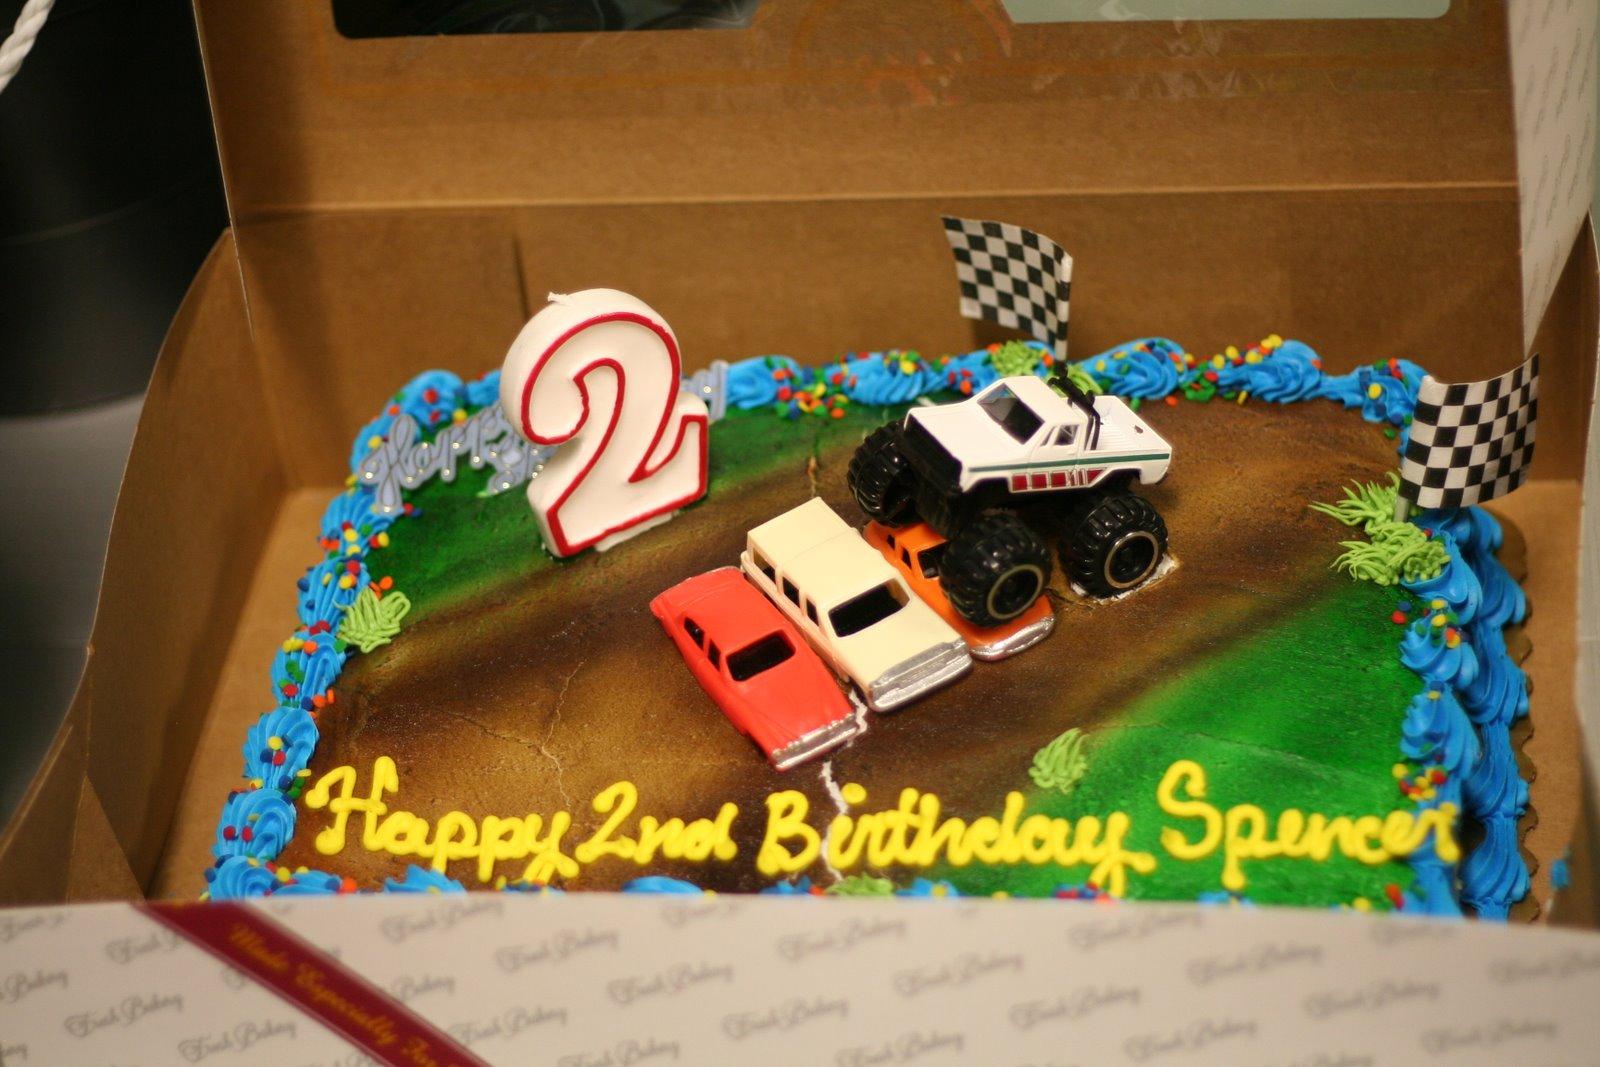 Spencer's 2nd birthday cake